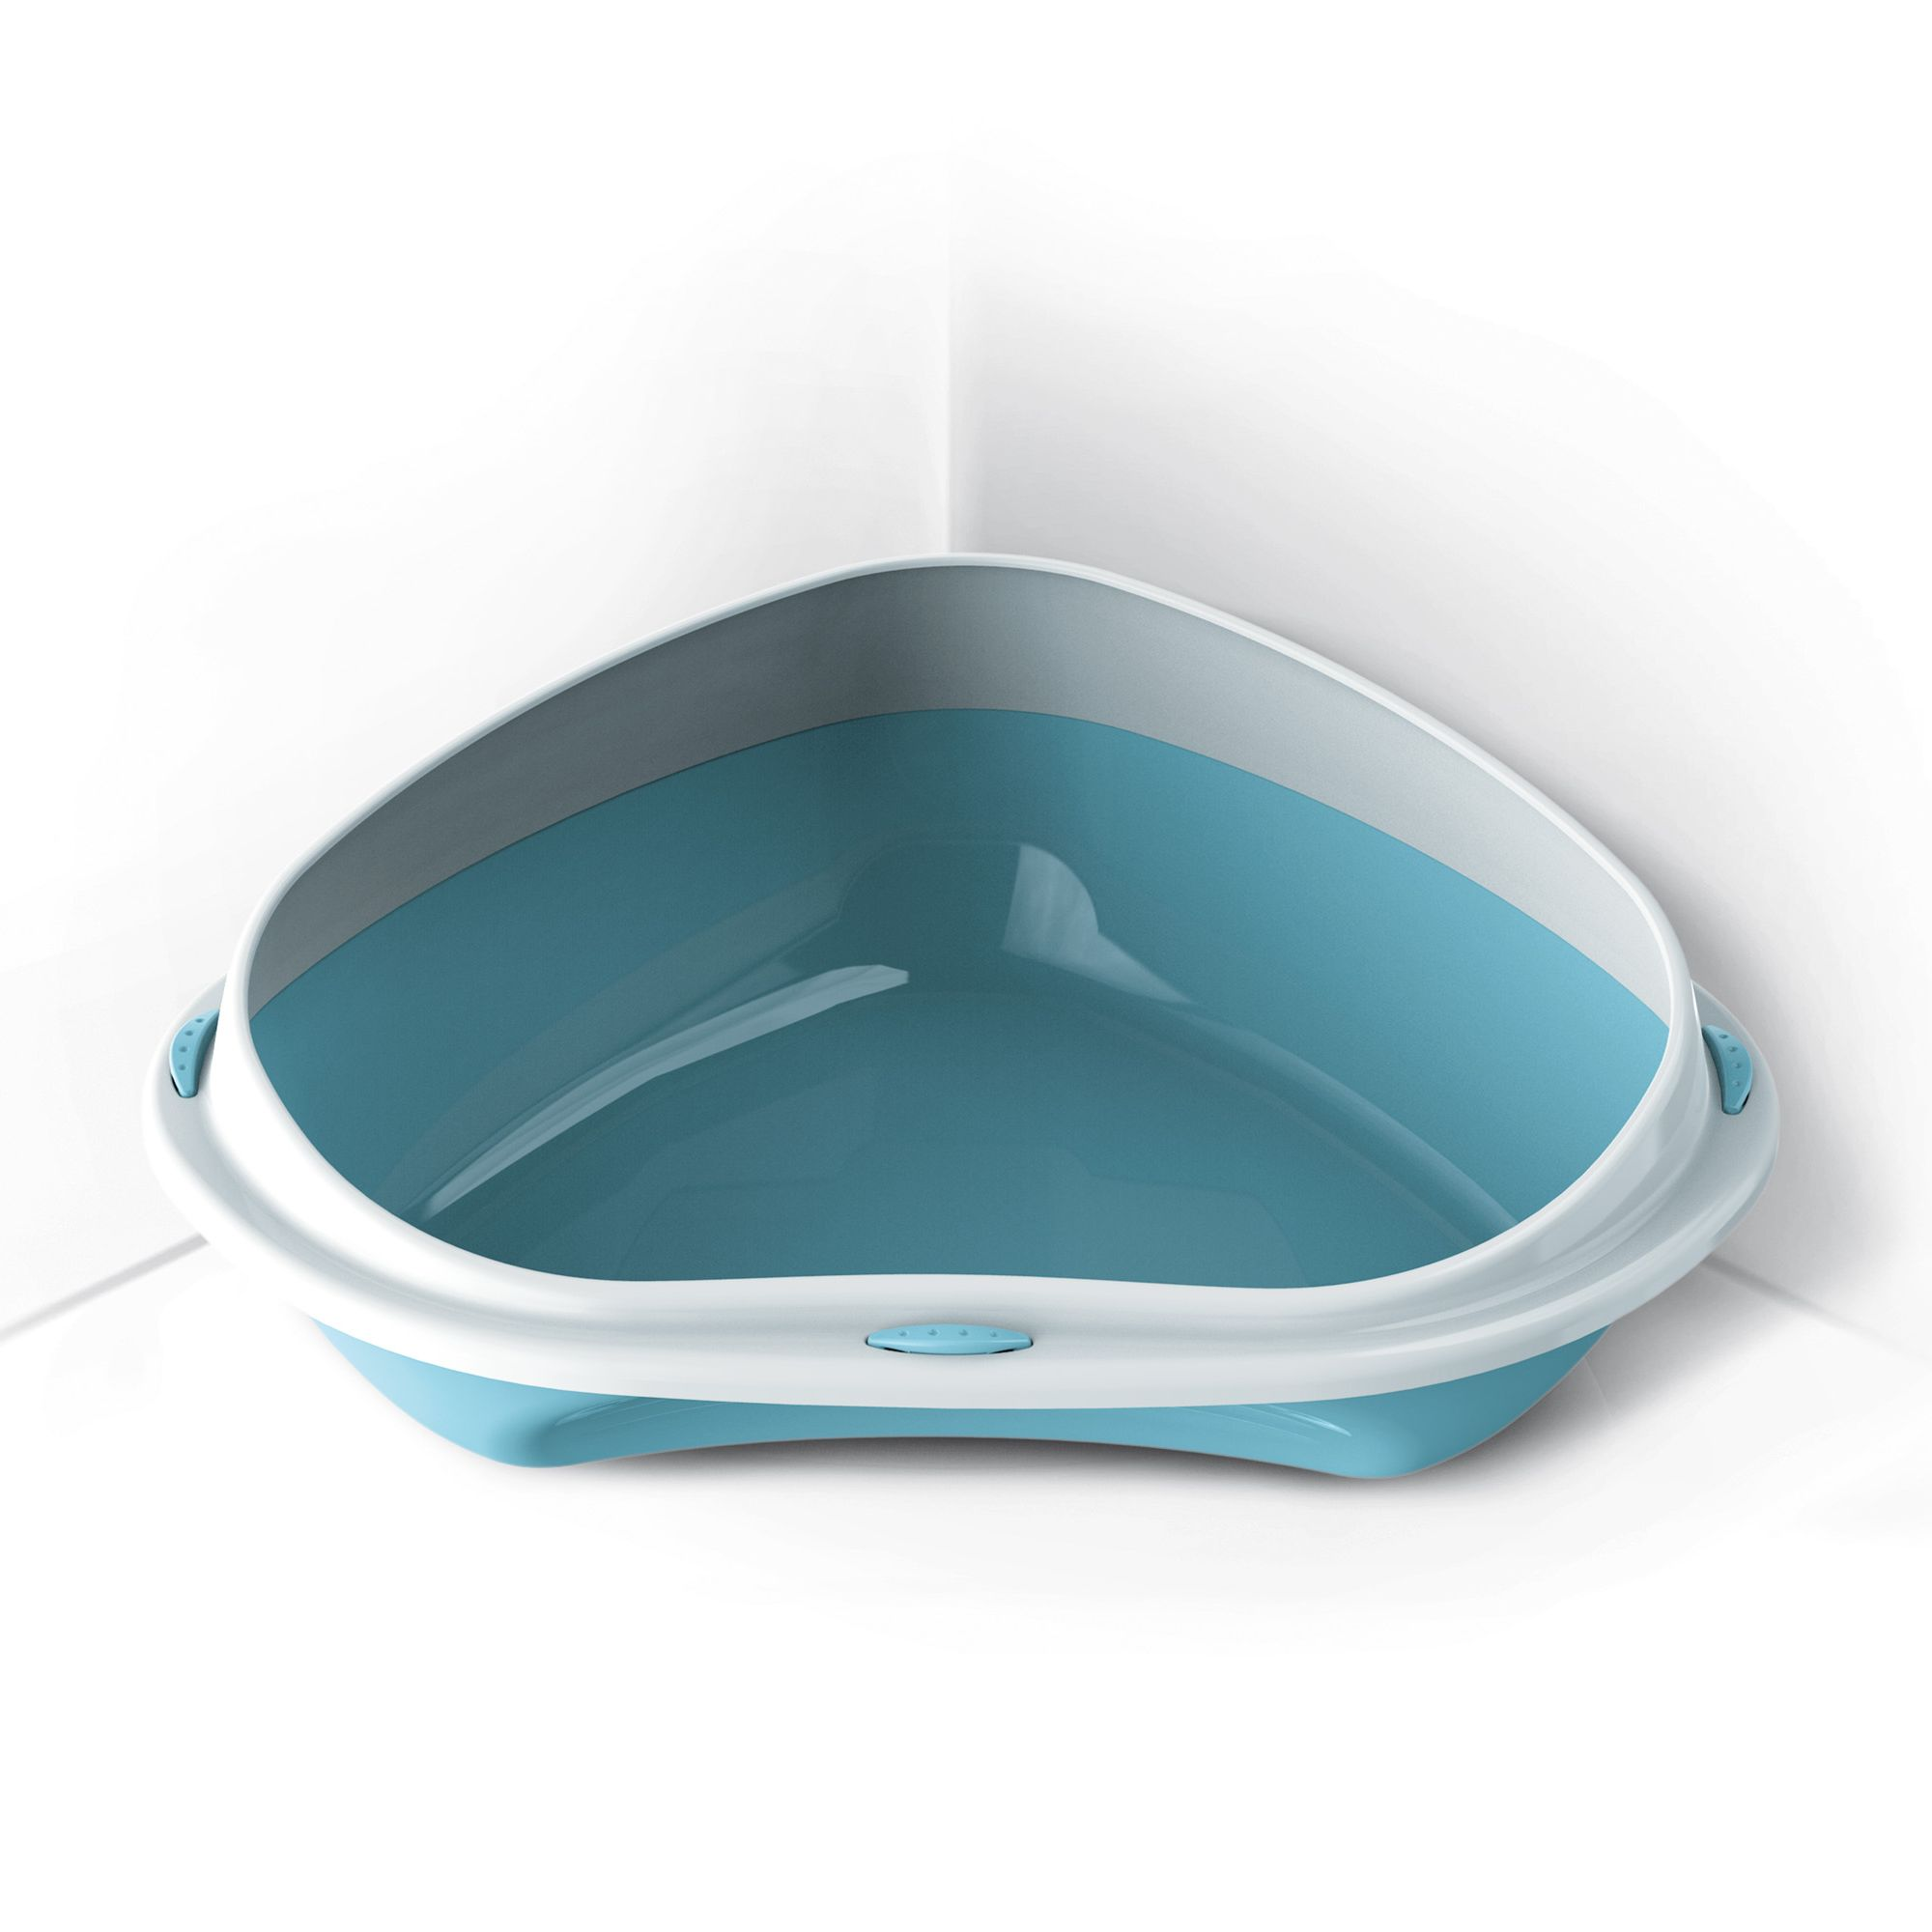 Rohová toaleta s vysokým okrajem Argi - modrá - 49 x 40 x 17,5 cm